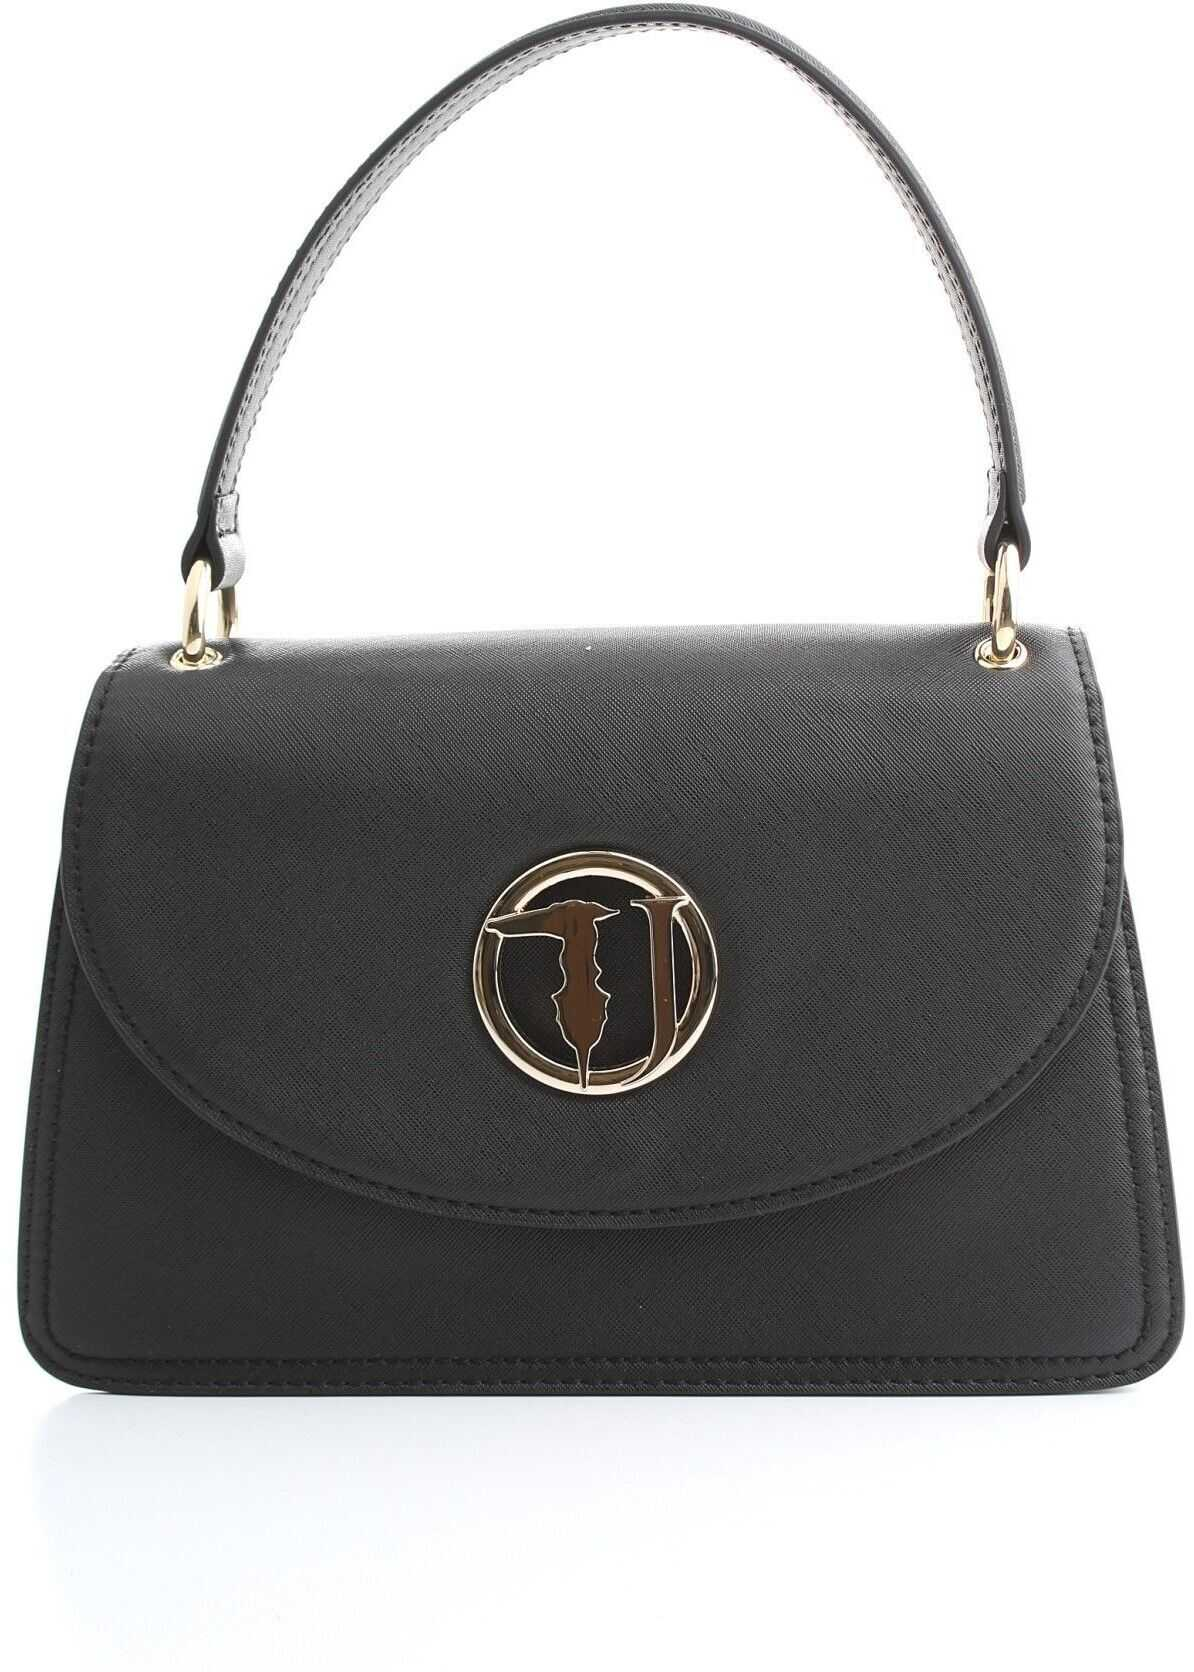 Trussardi Faux Leather Handbag BLACK